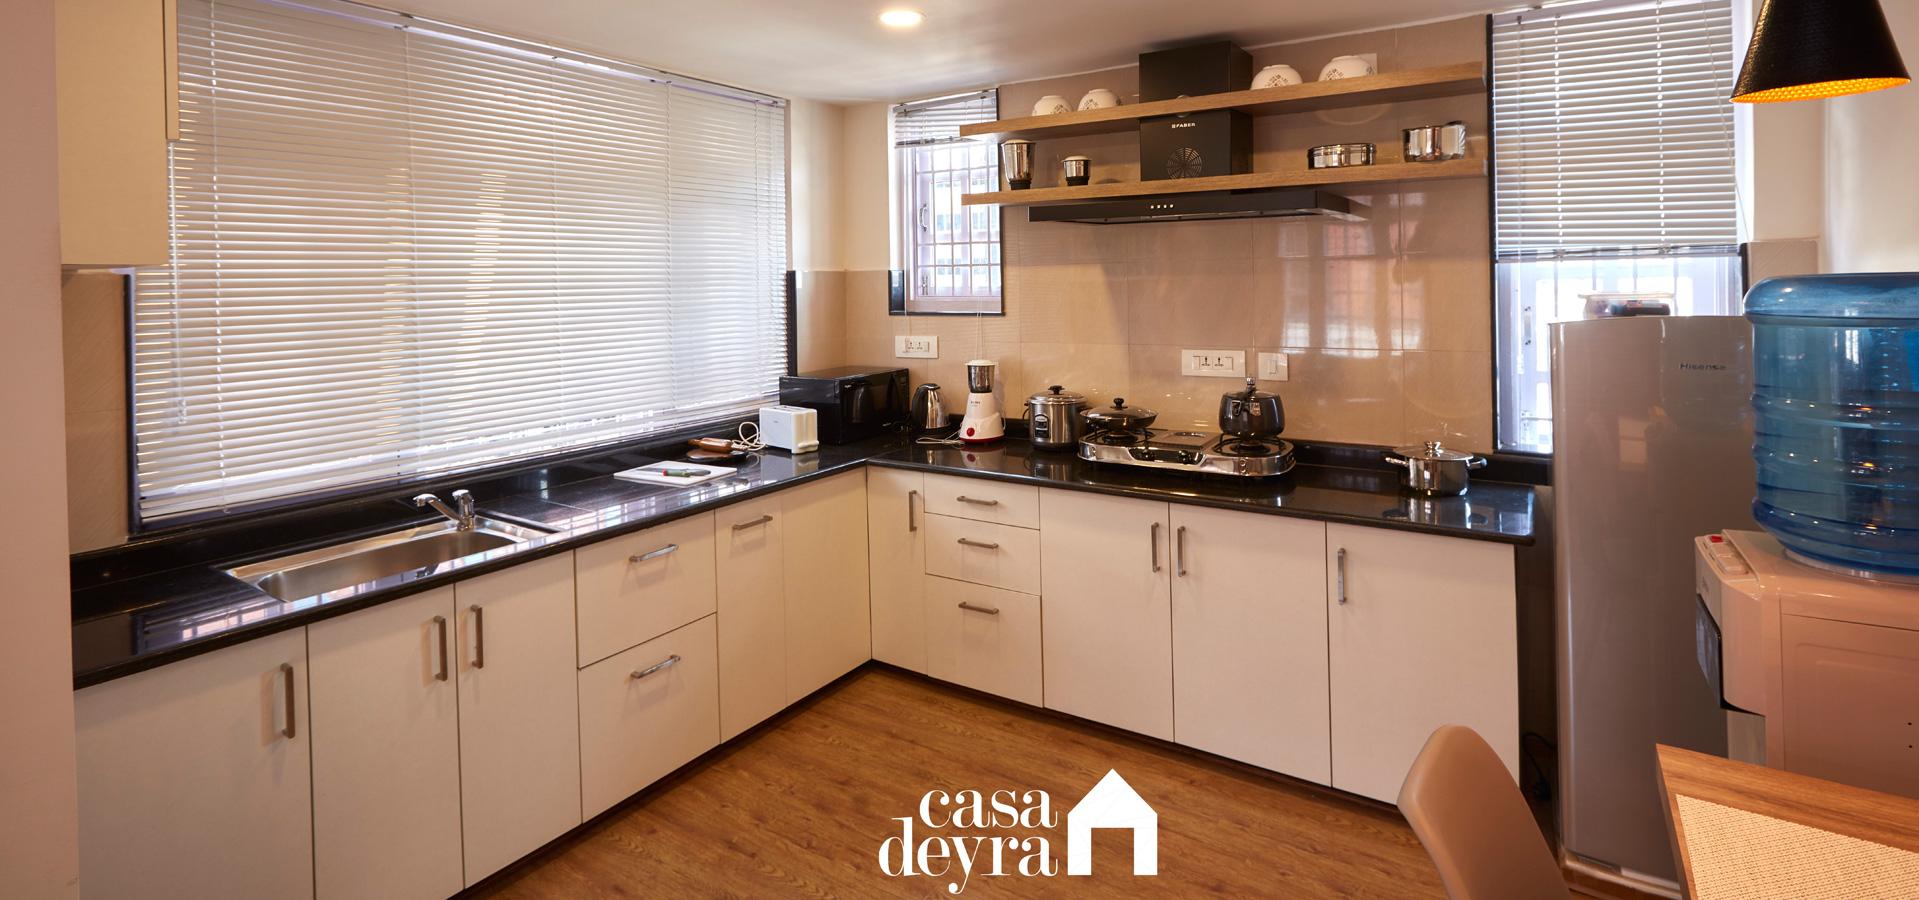 Thamel_web_1st_kitchen